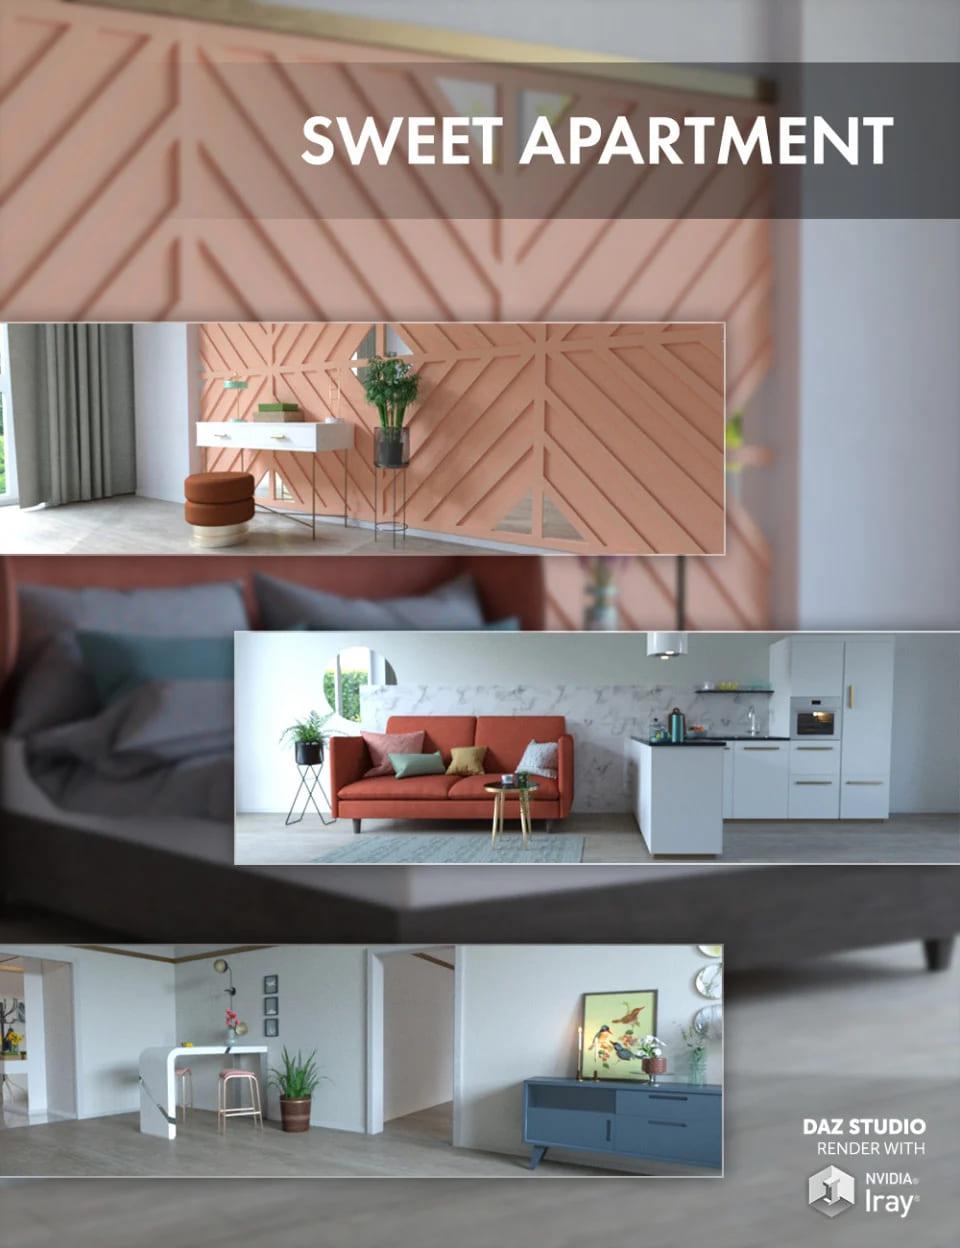 Sweet Apartment_DAZ3D下载站